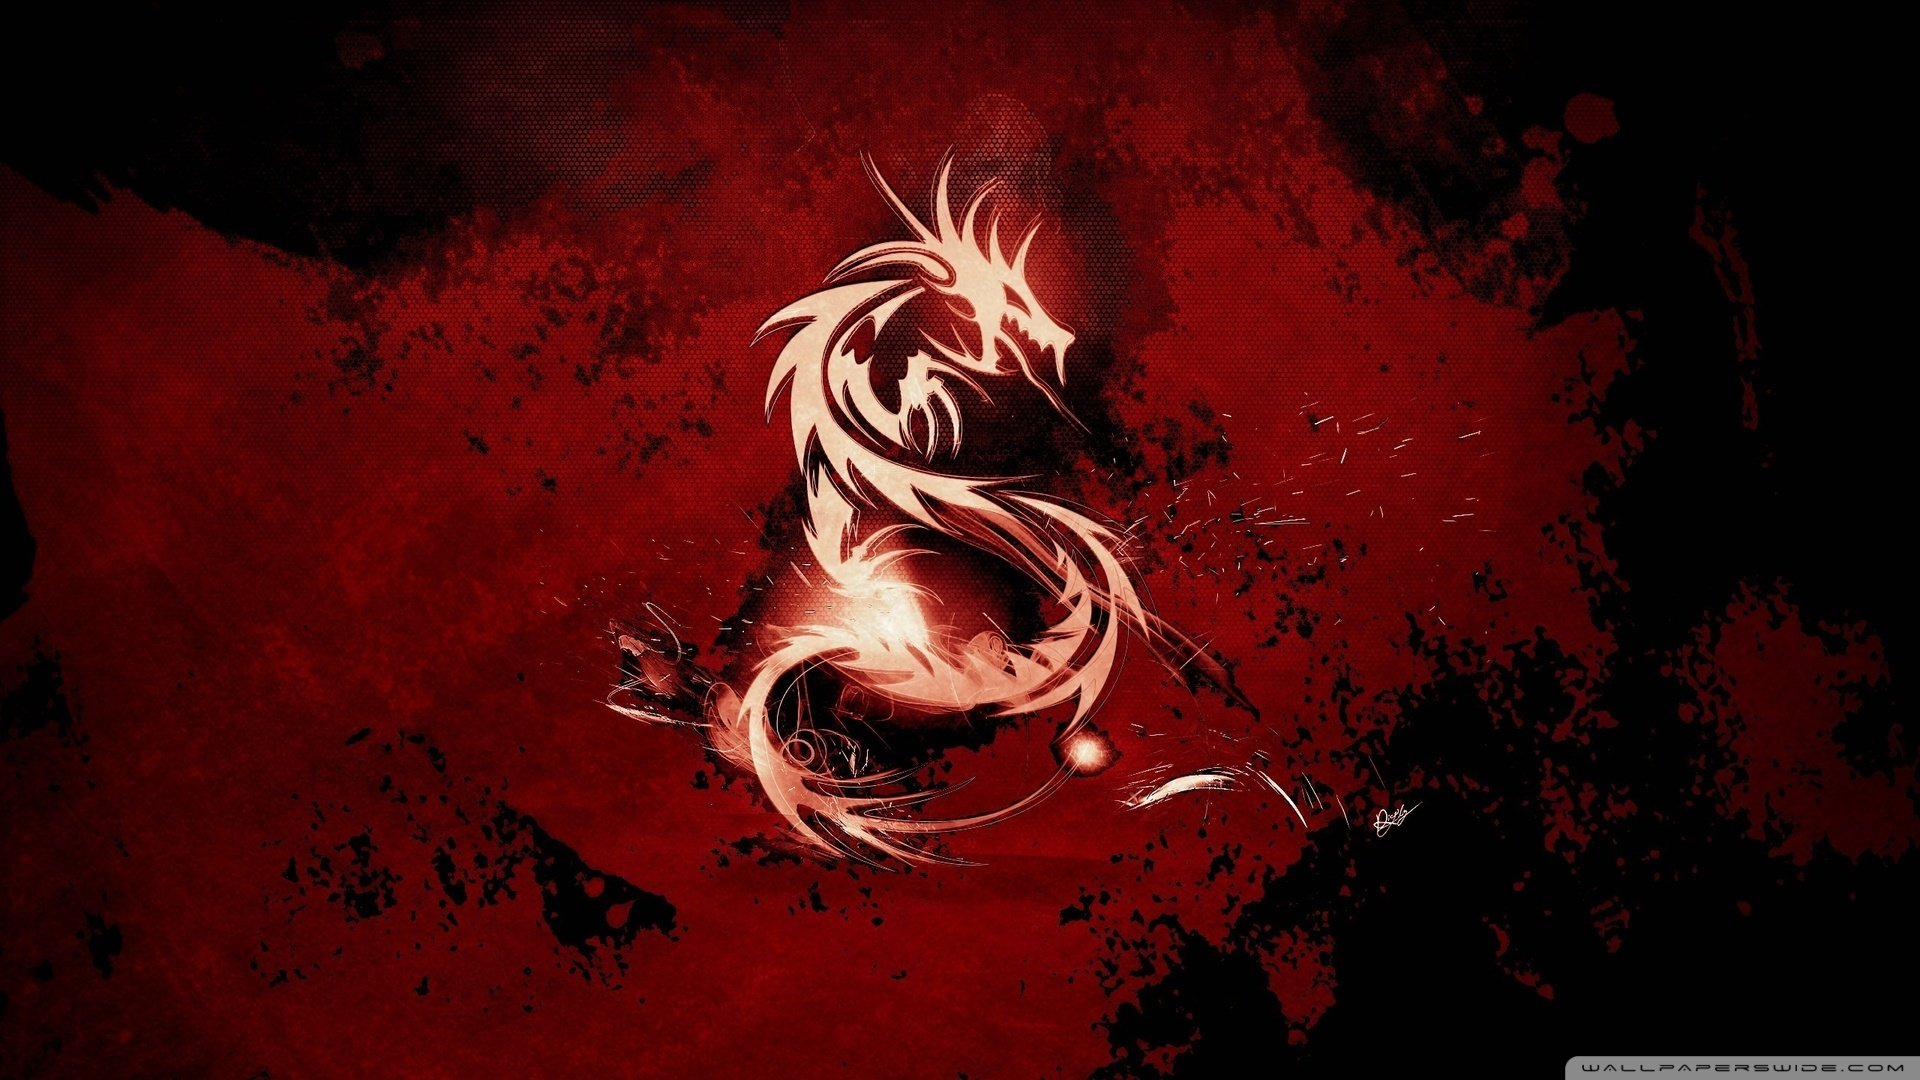 47 Red Dragon Gaming Wallpaper On Wallpapersafari